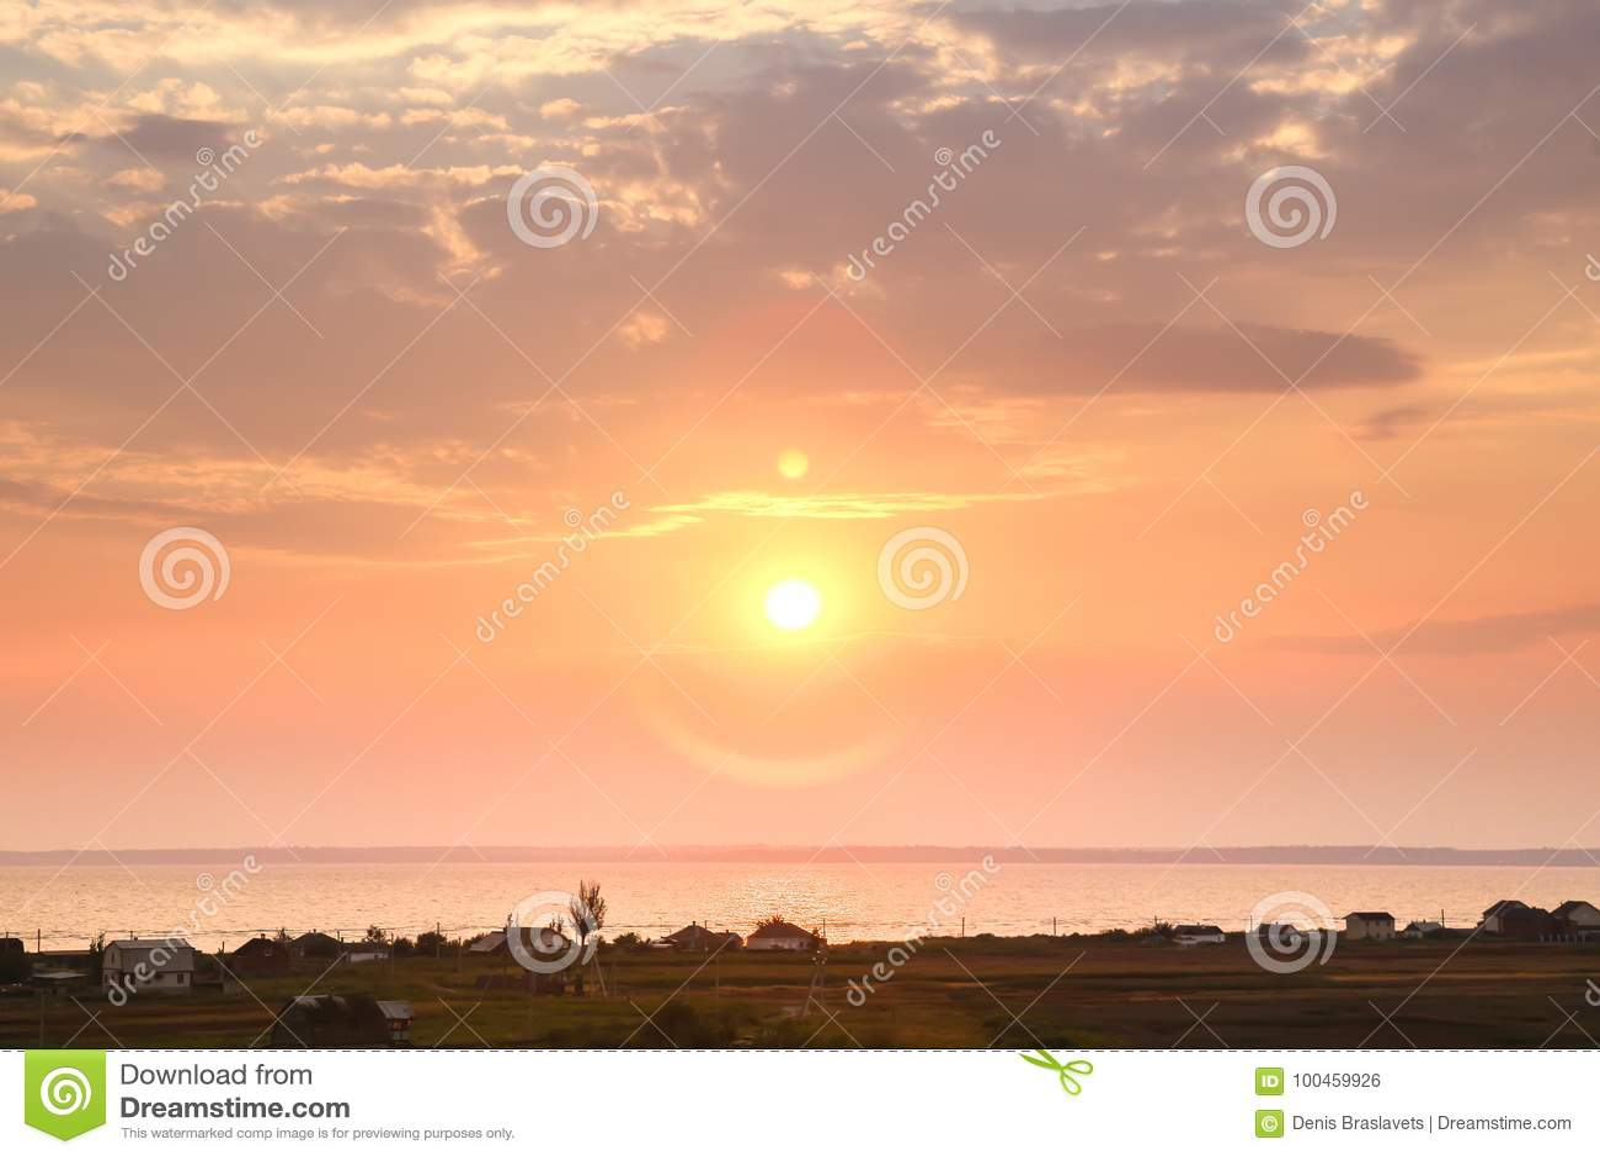 Beautiful sunset on the sea at twilight times Vintage Filter